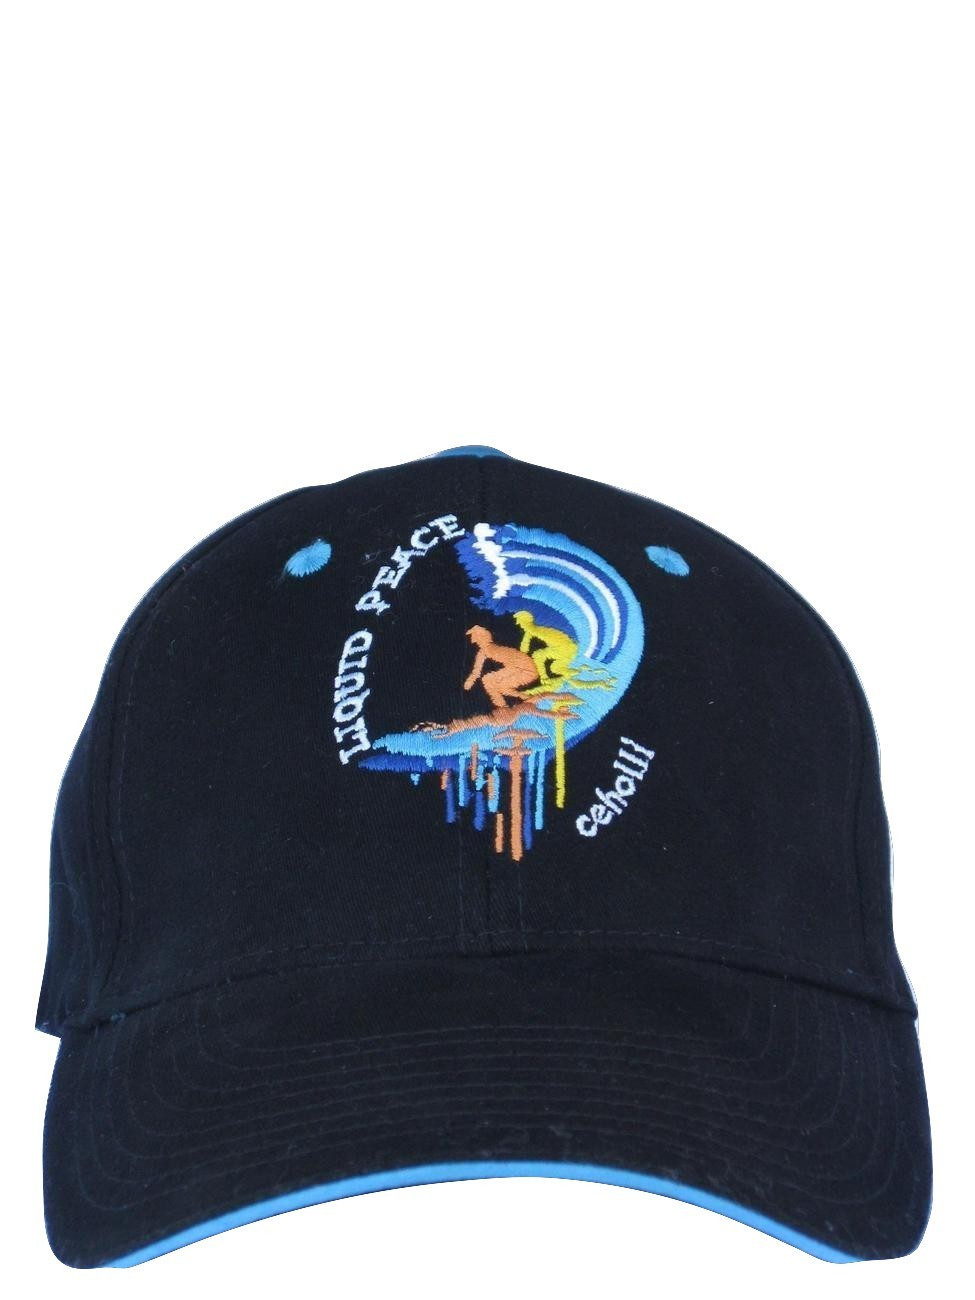 Liquid Peace Low Profile, StretchFit, Embroidered Cap